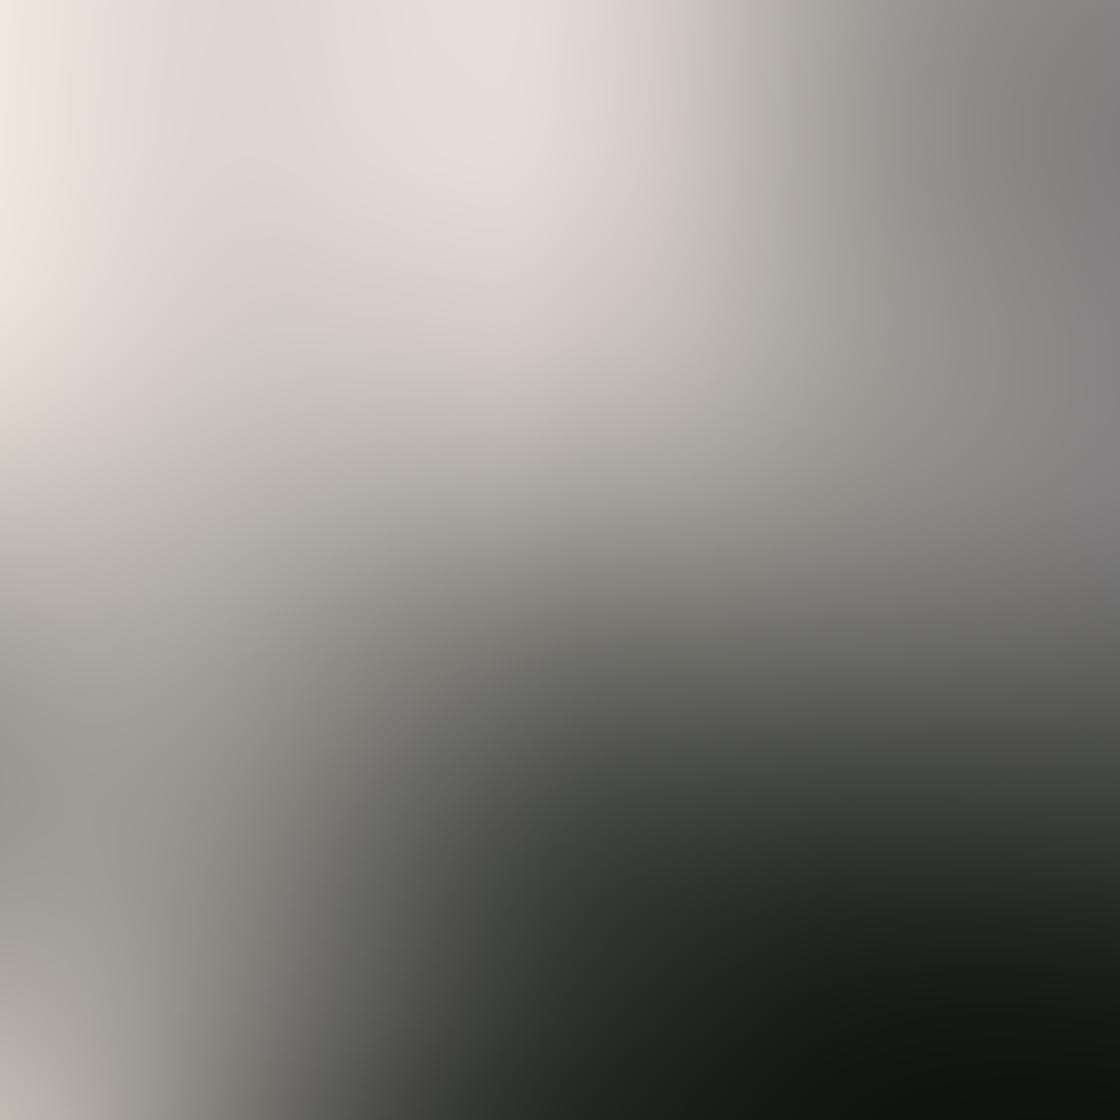 iPhone Angle Photo 01